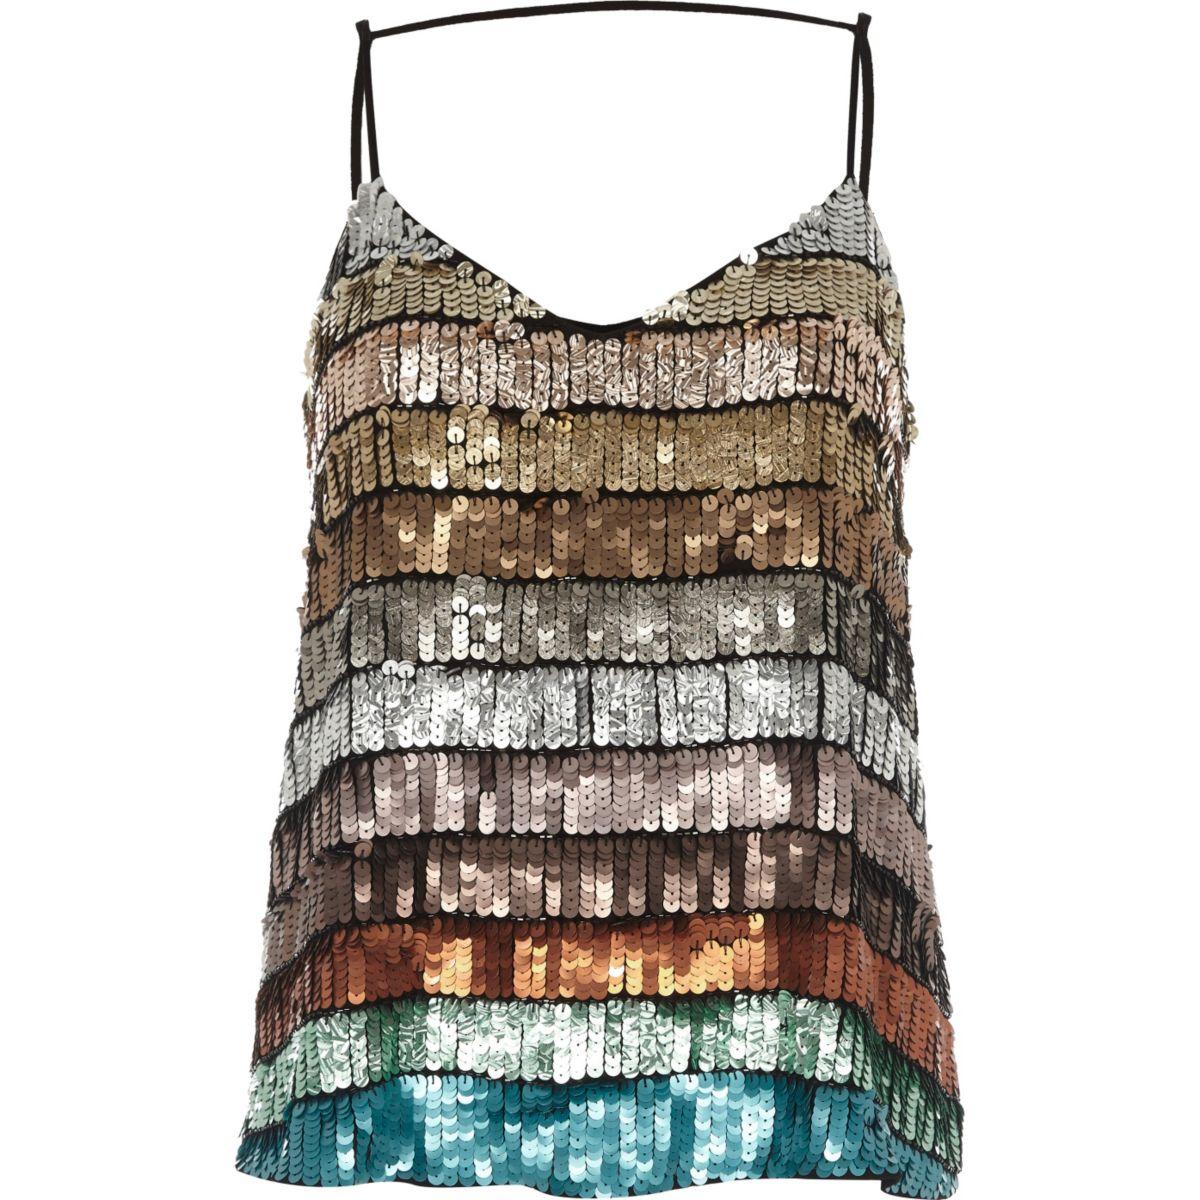 Turquoise multi colored sequin cami top